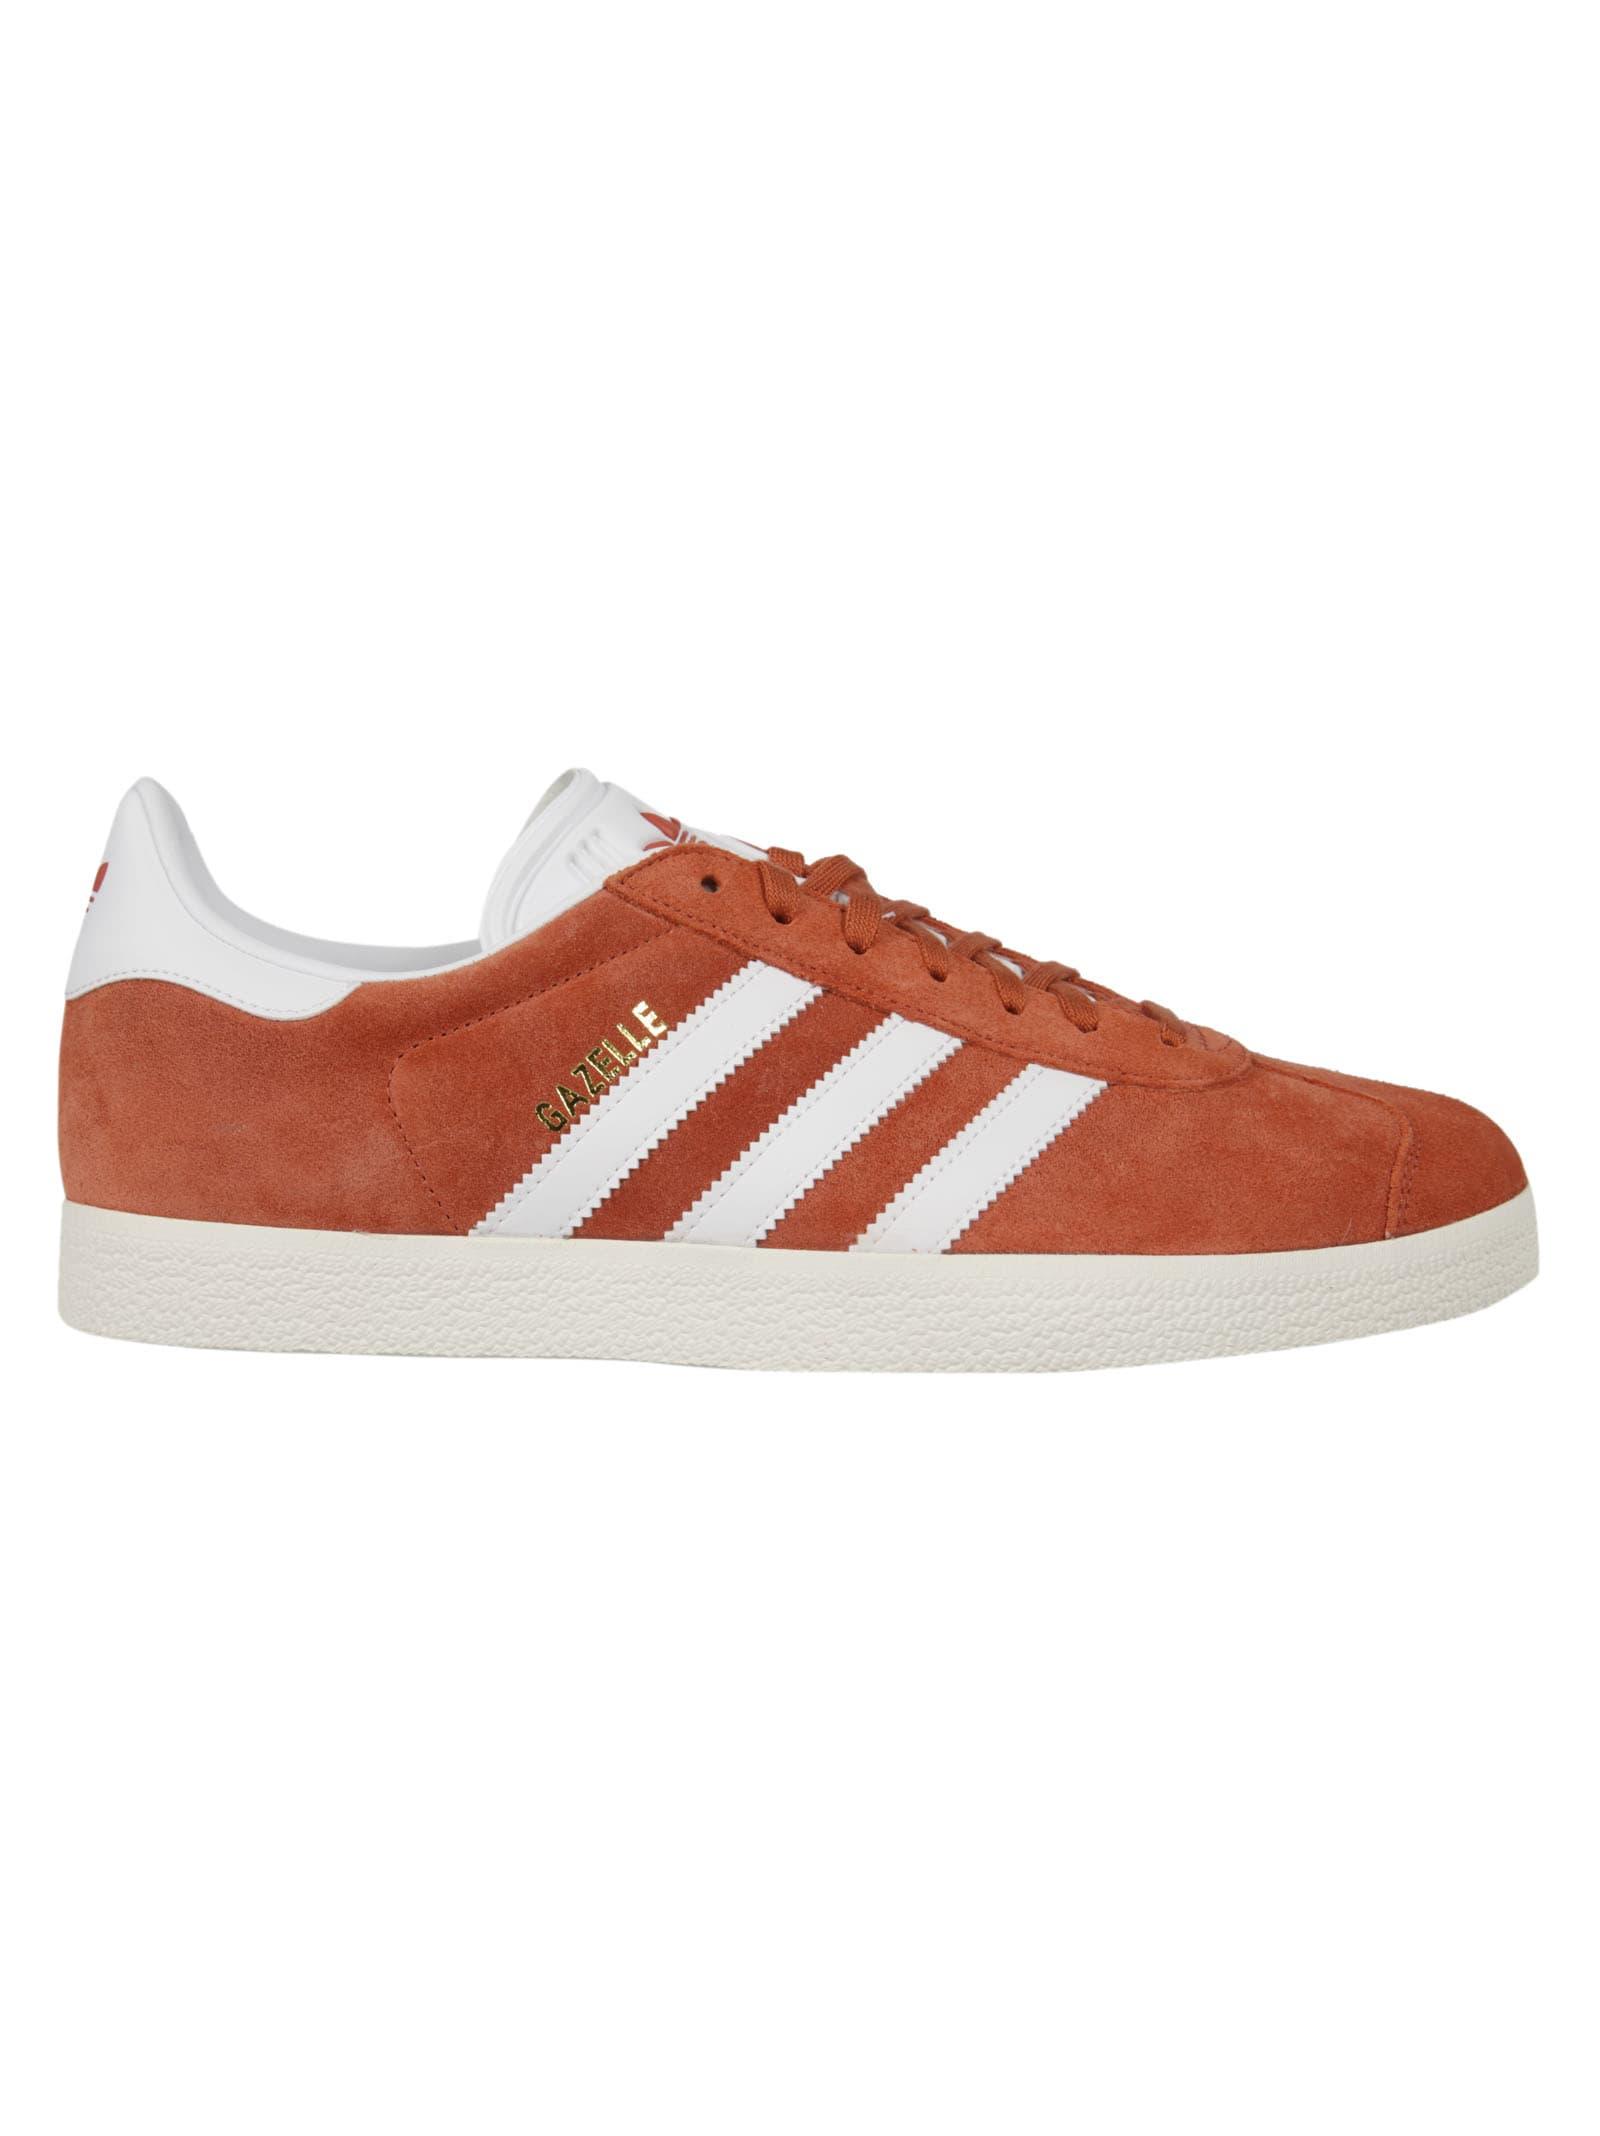 sélection premium 3778a 6b71e Adidas Originals Gazelle Sneakers